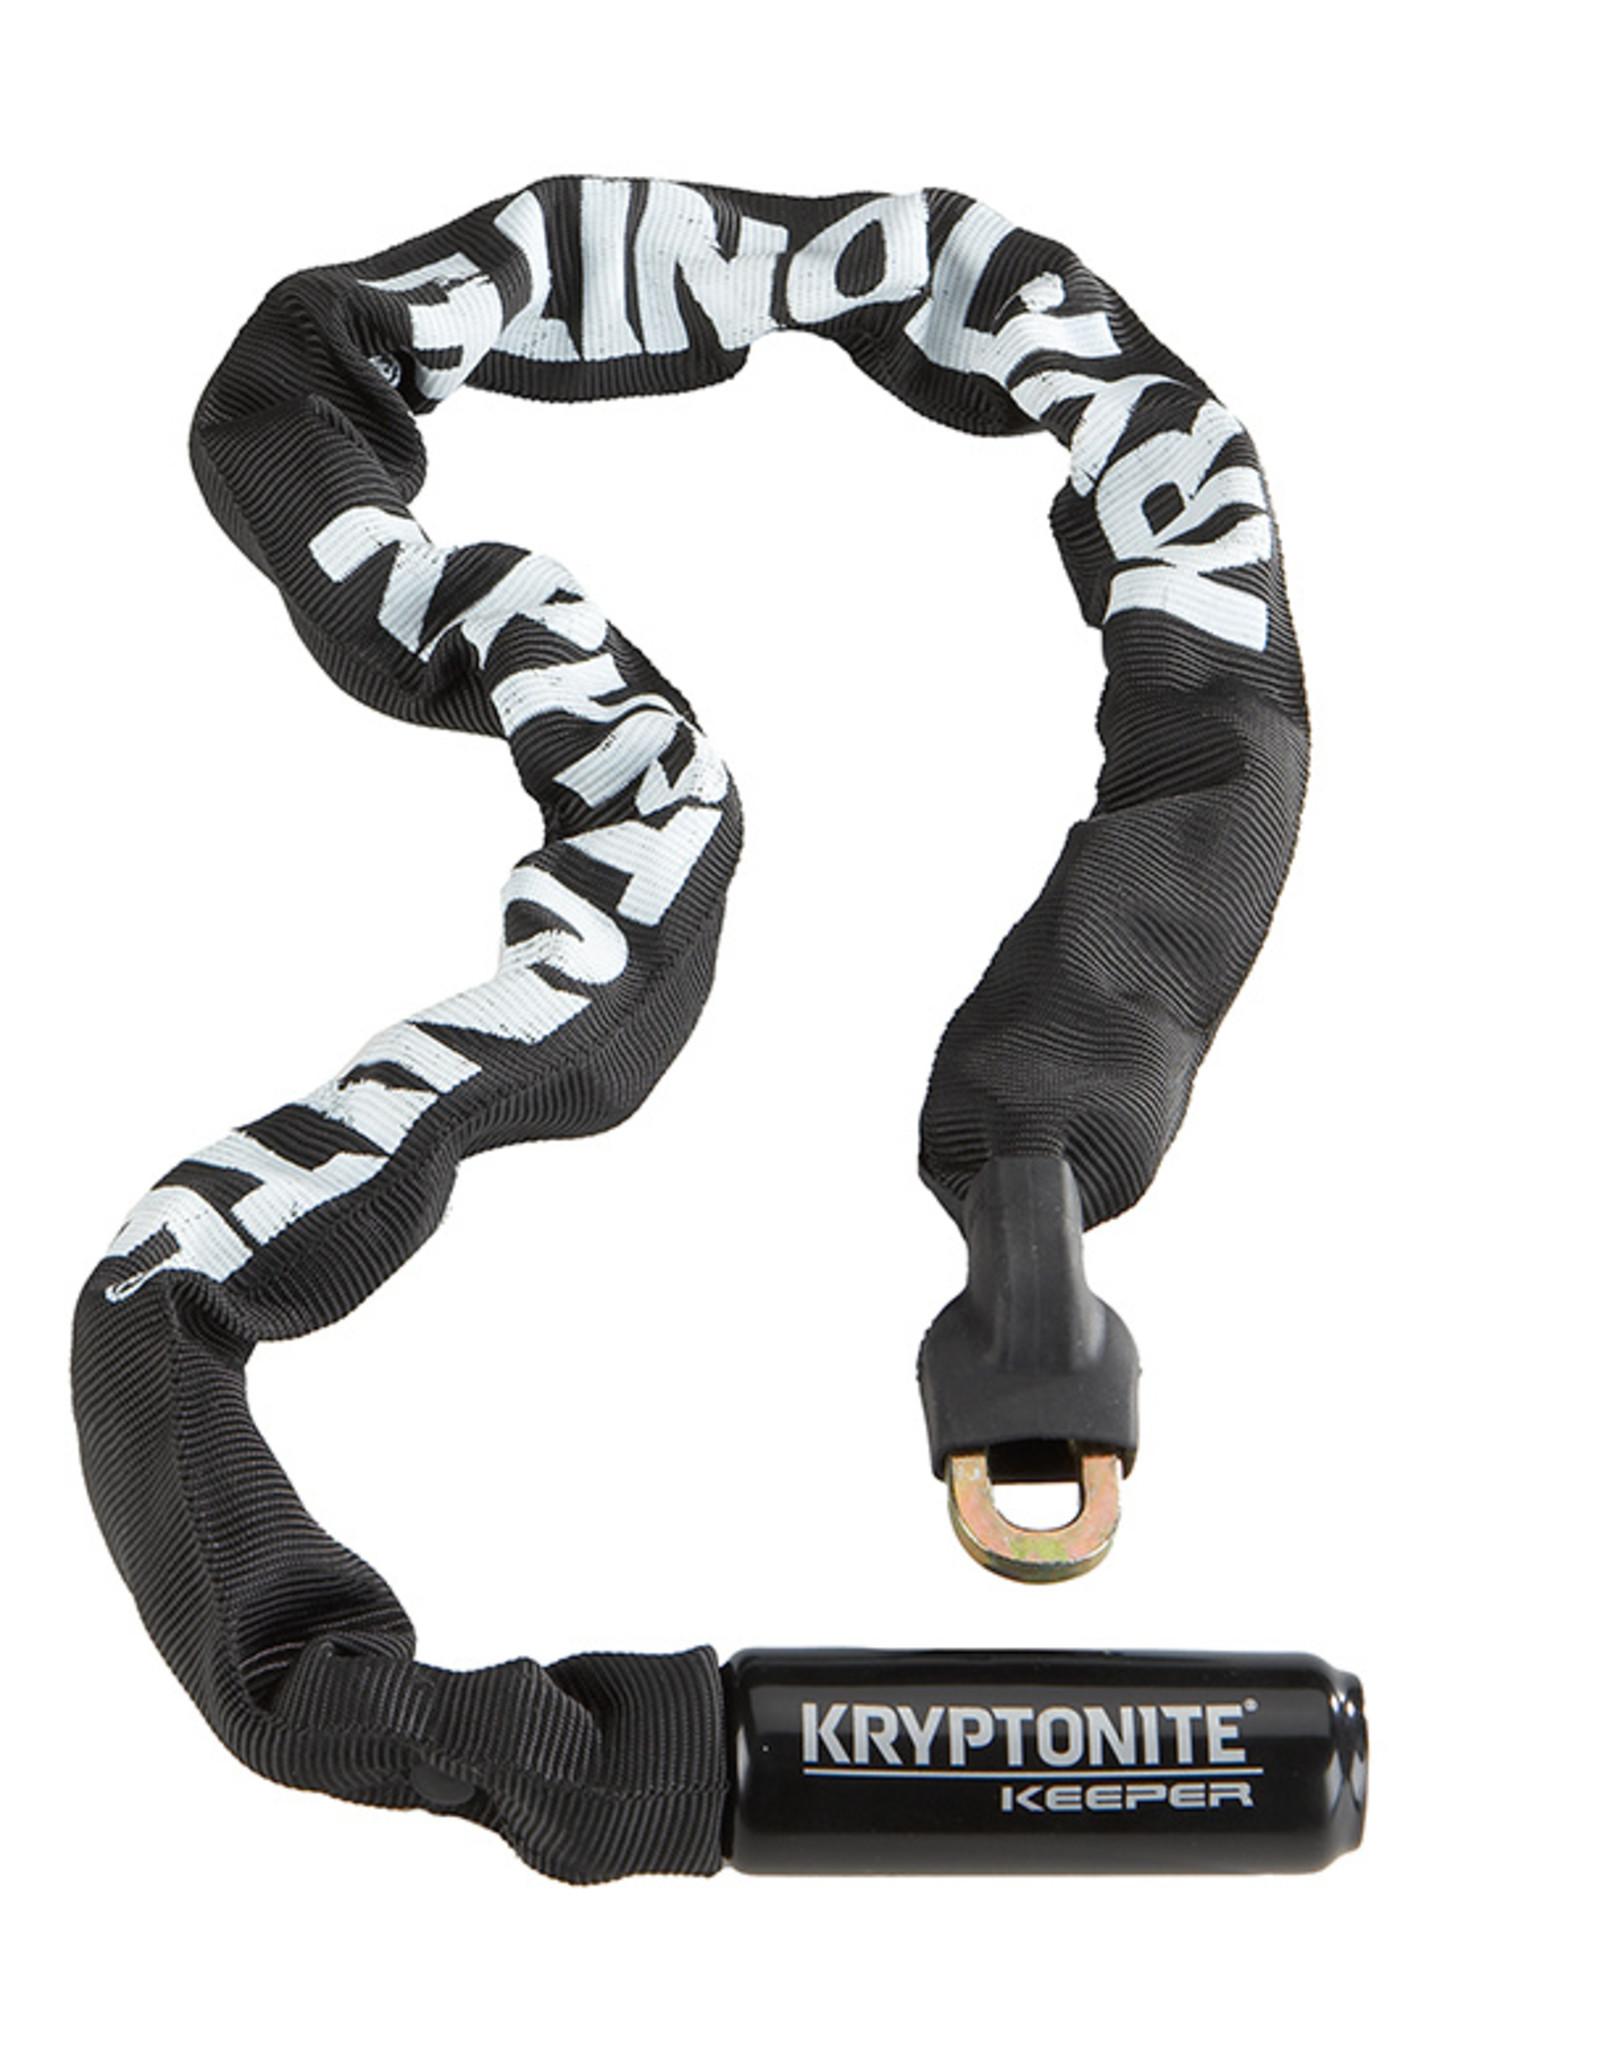 Kryptonite Keeper 785 Integrated Chain Lock - Grey